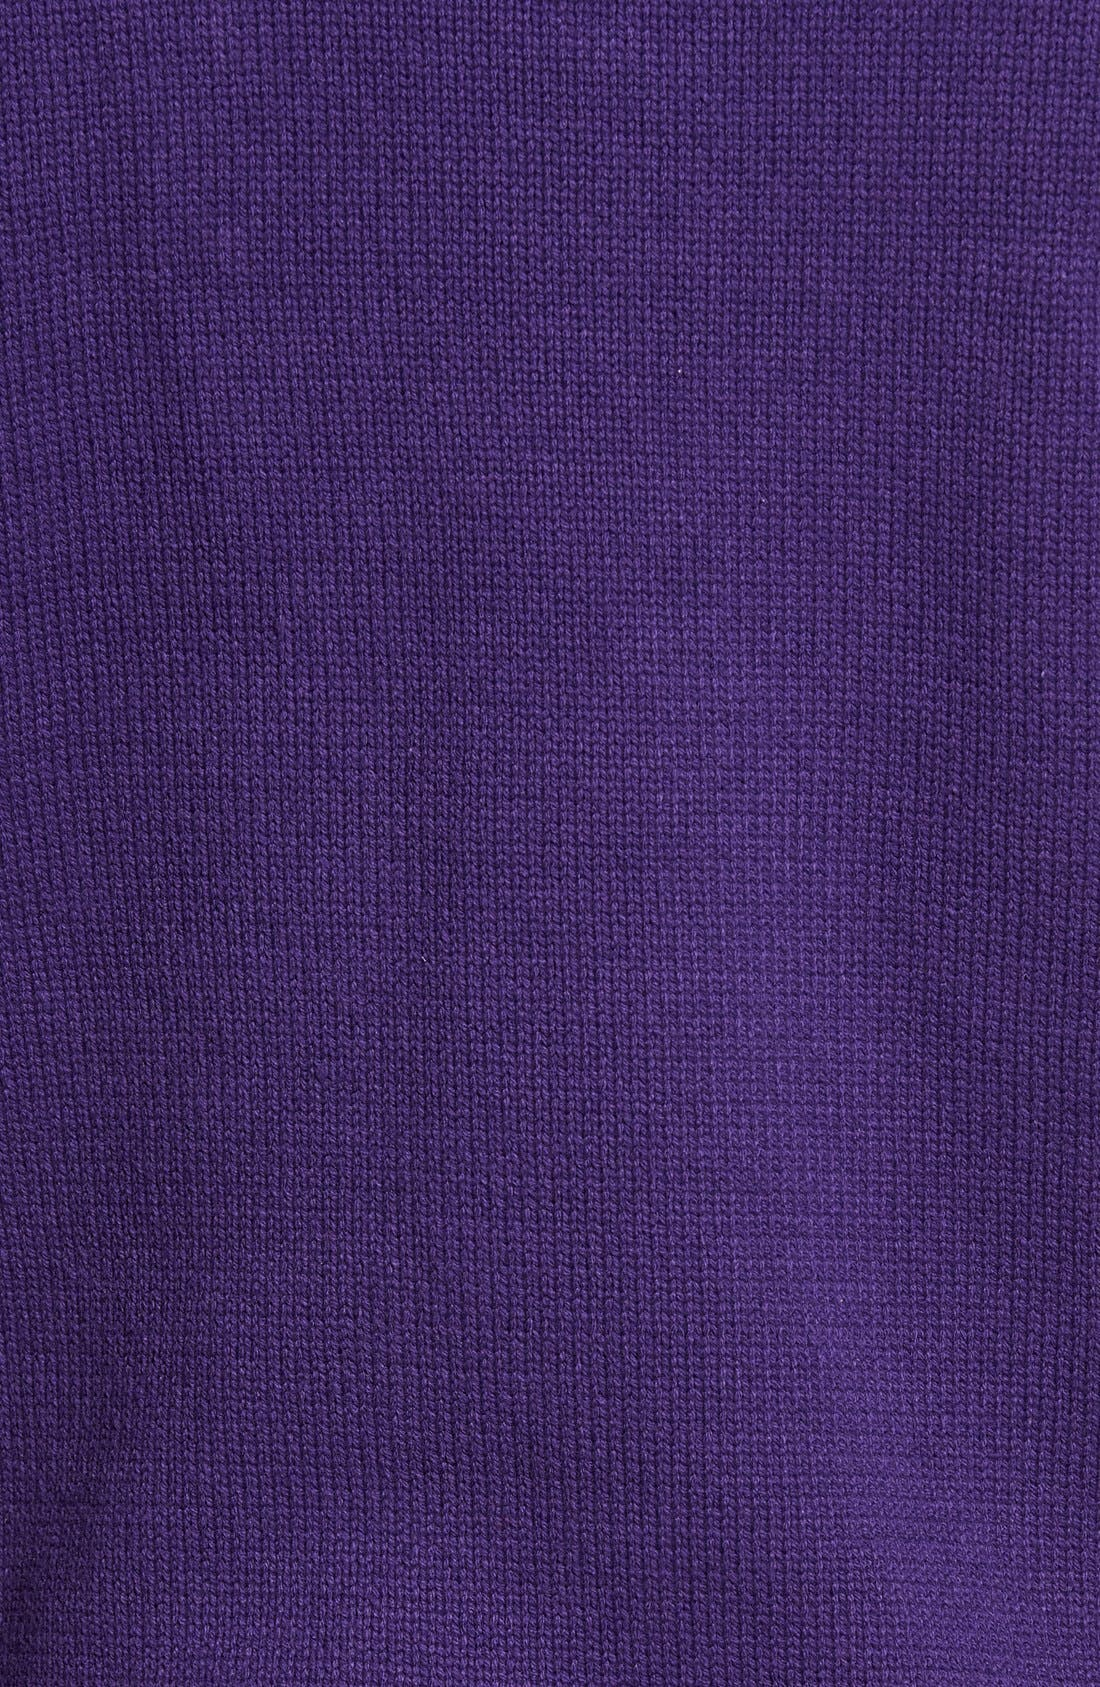 HILLFLINT,                             TCU Heritage Sweater,                             Alternate thumbnail 5, color,                             500